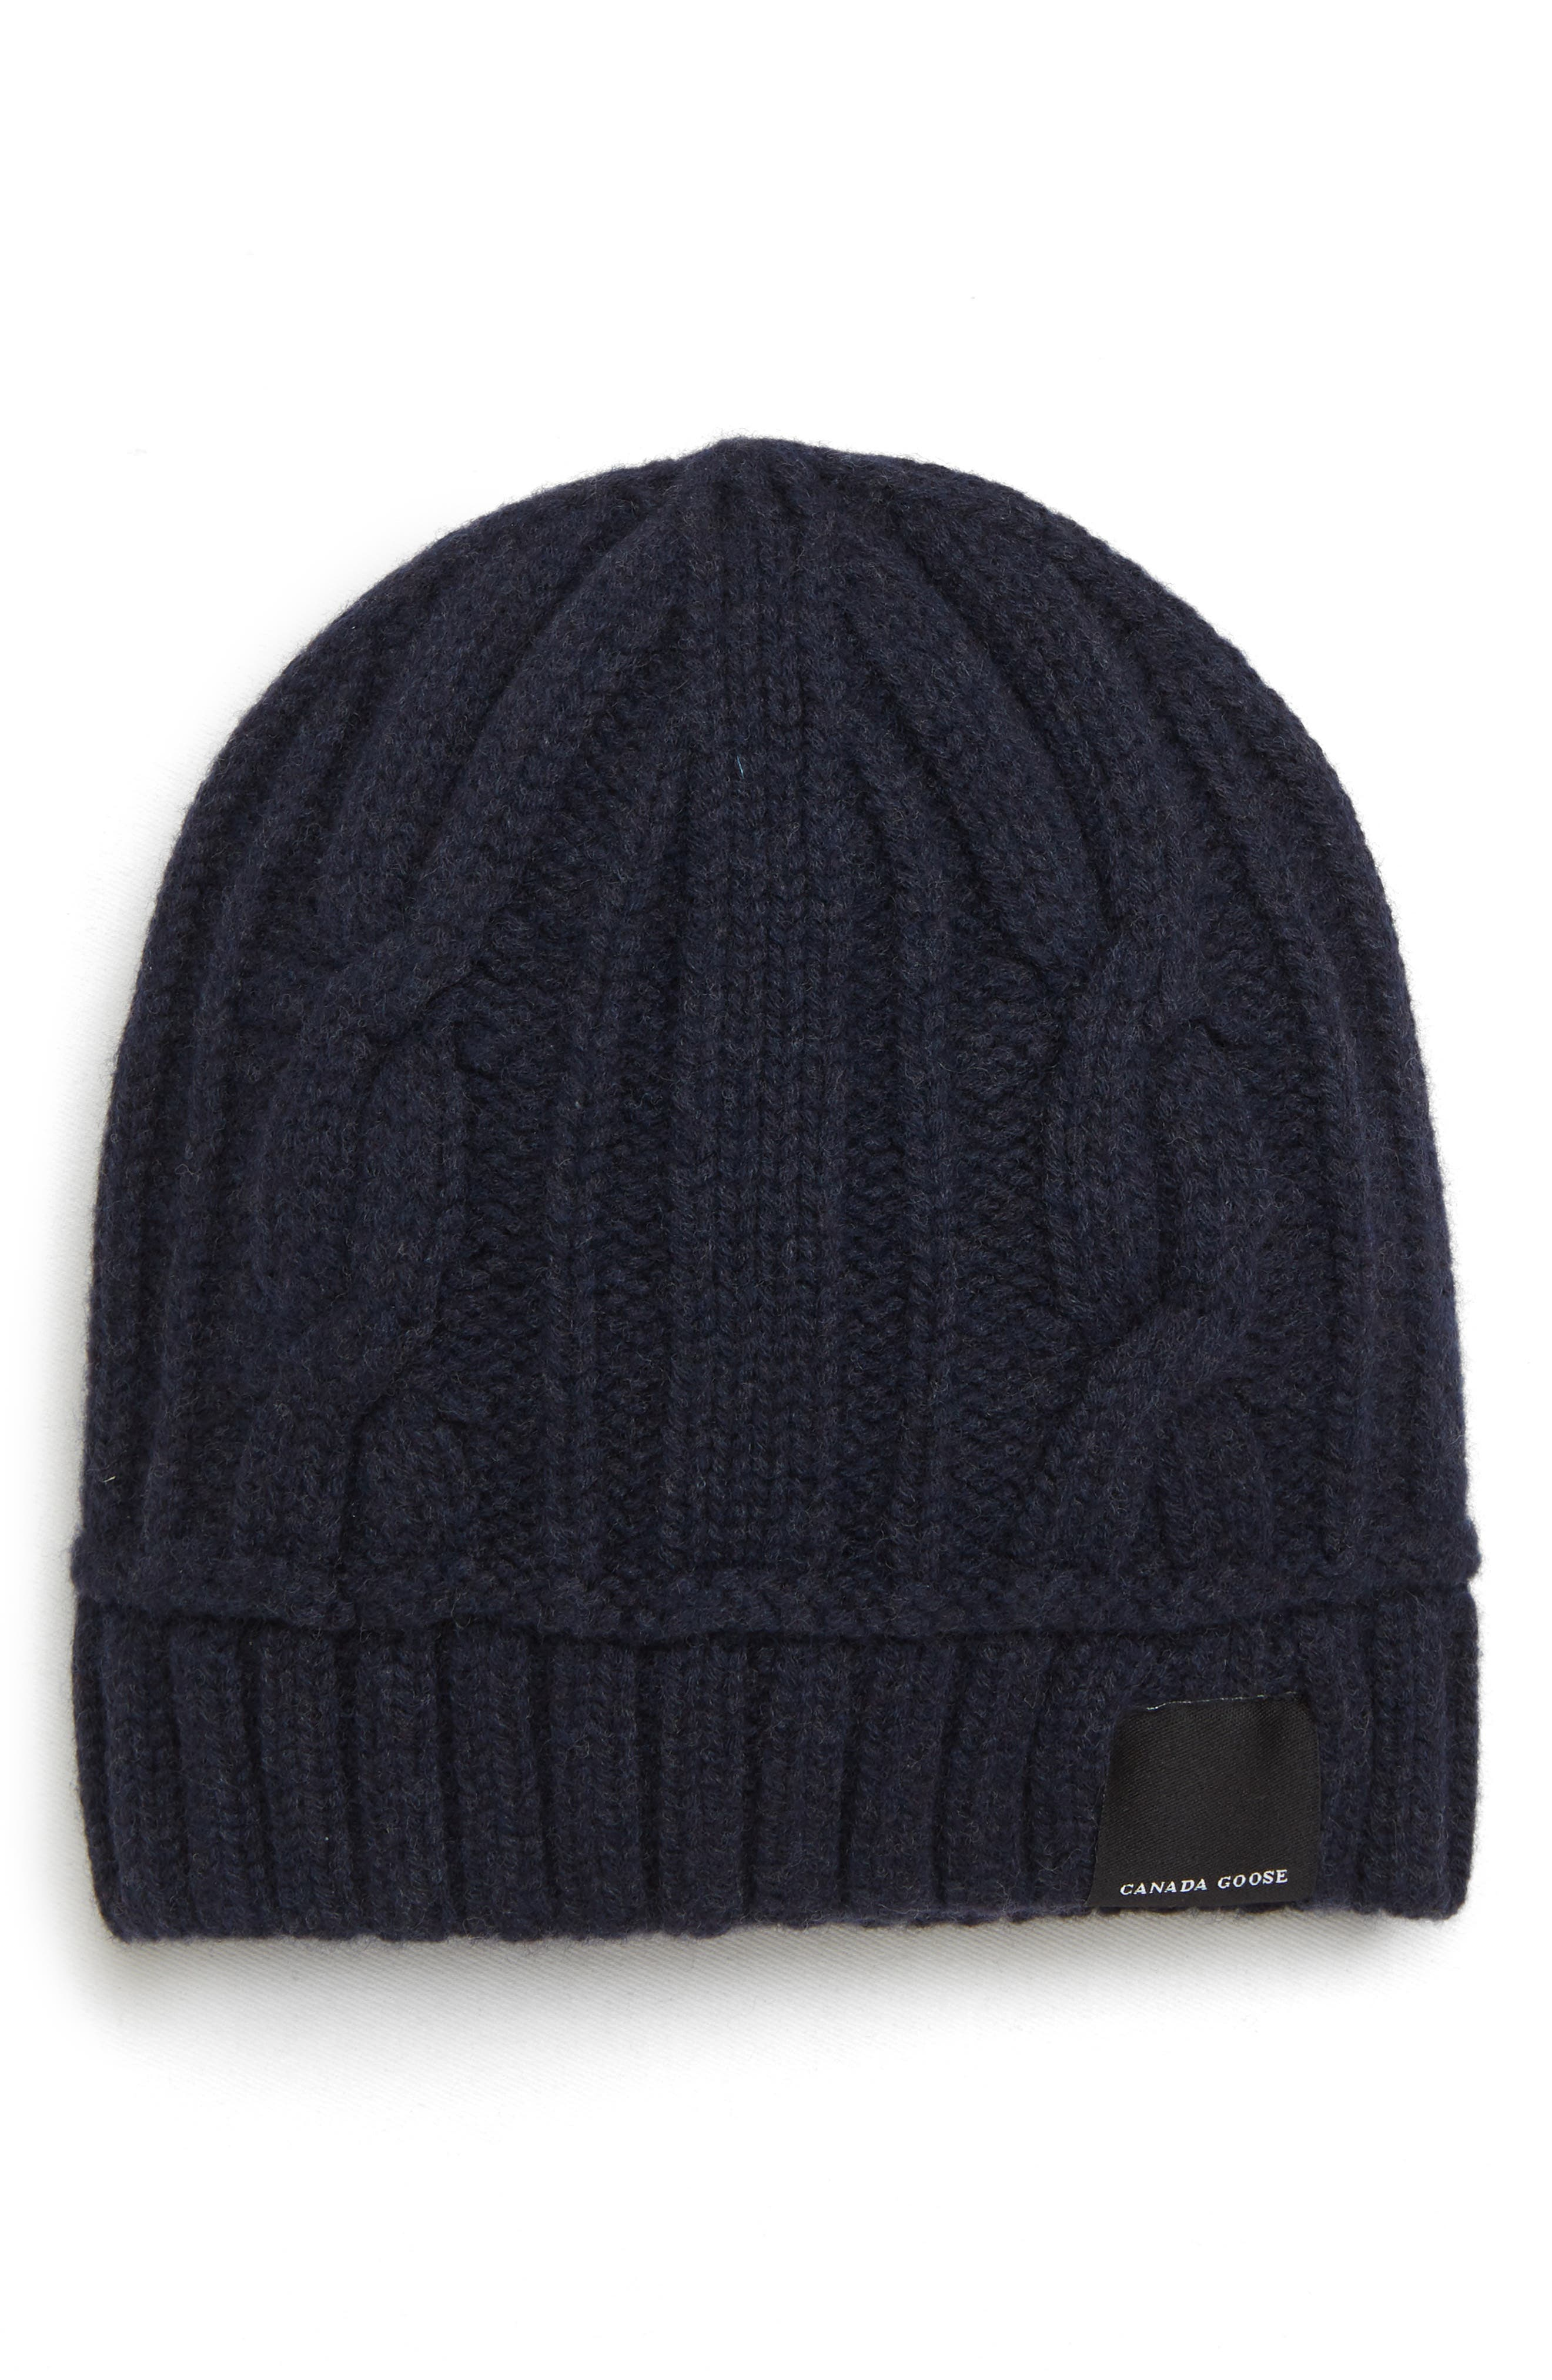 7010dfad Men's Beanies: Knit Caps & Winter Hats | Nordstrom